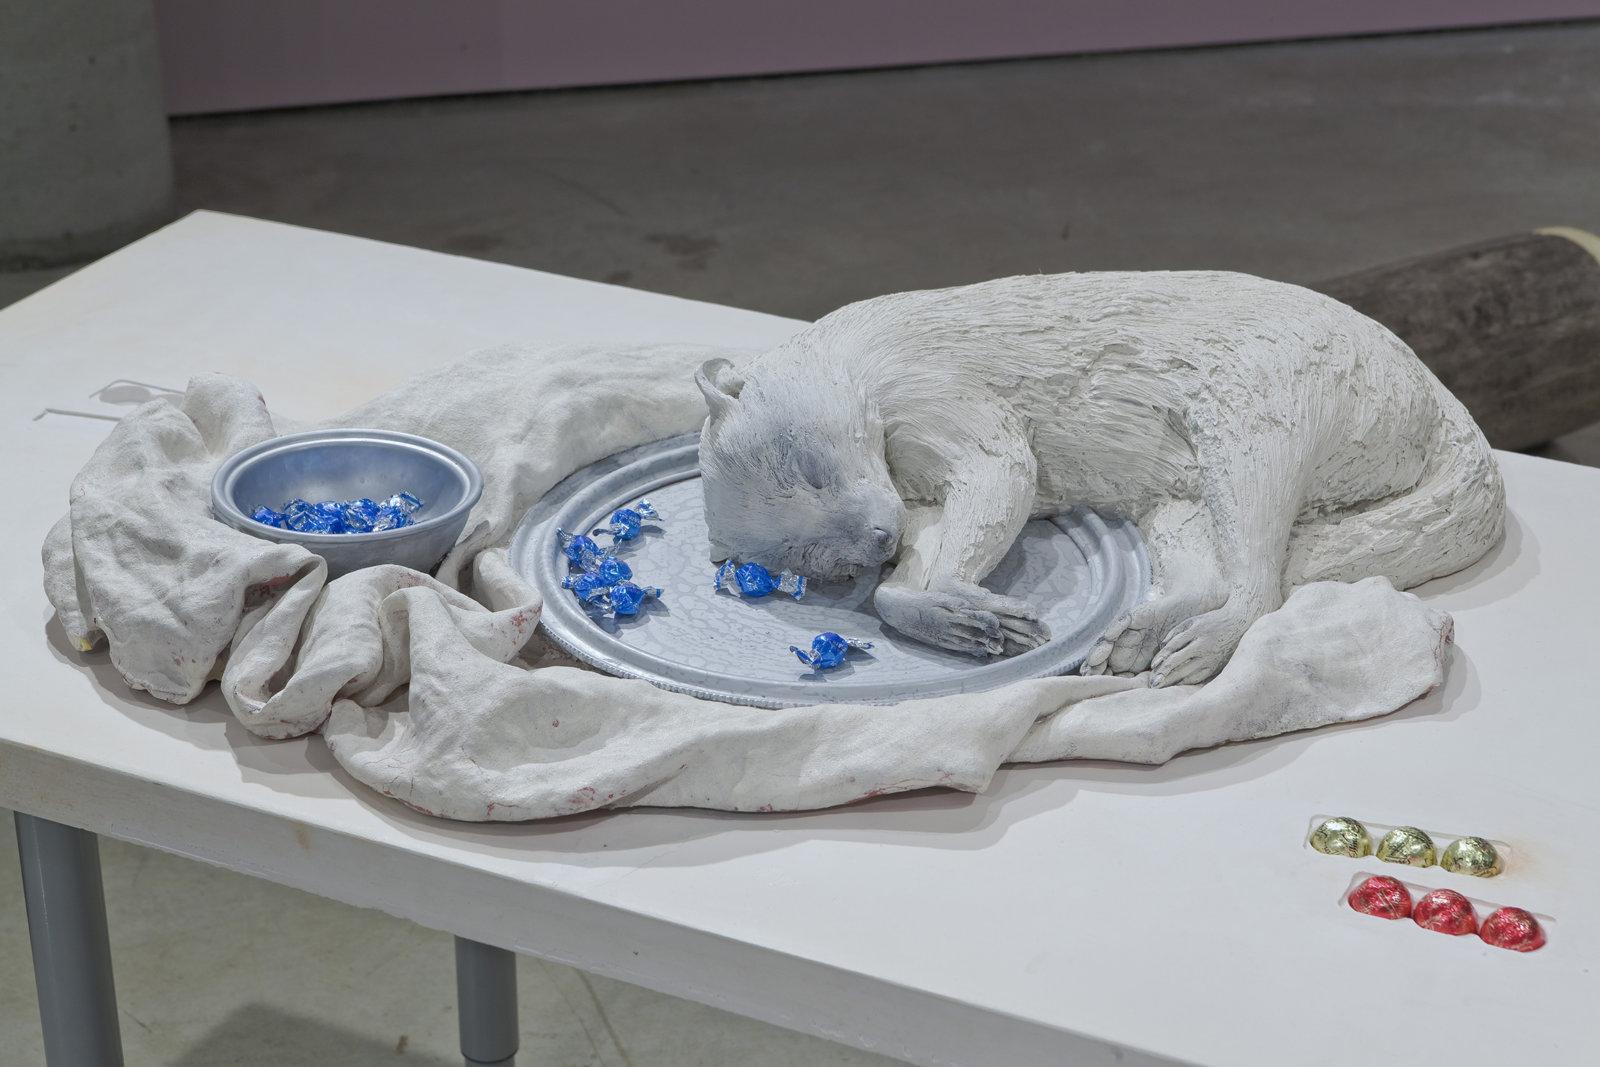 Liz Magor, Racoon, 2008, polymerized gypsum, 5 x 21 x 33 in. (13 x 54 x 84 cm) by Liz Magor